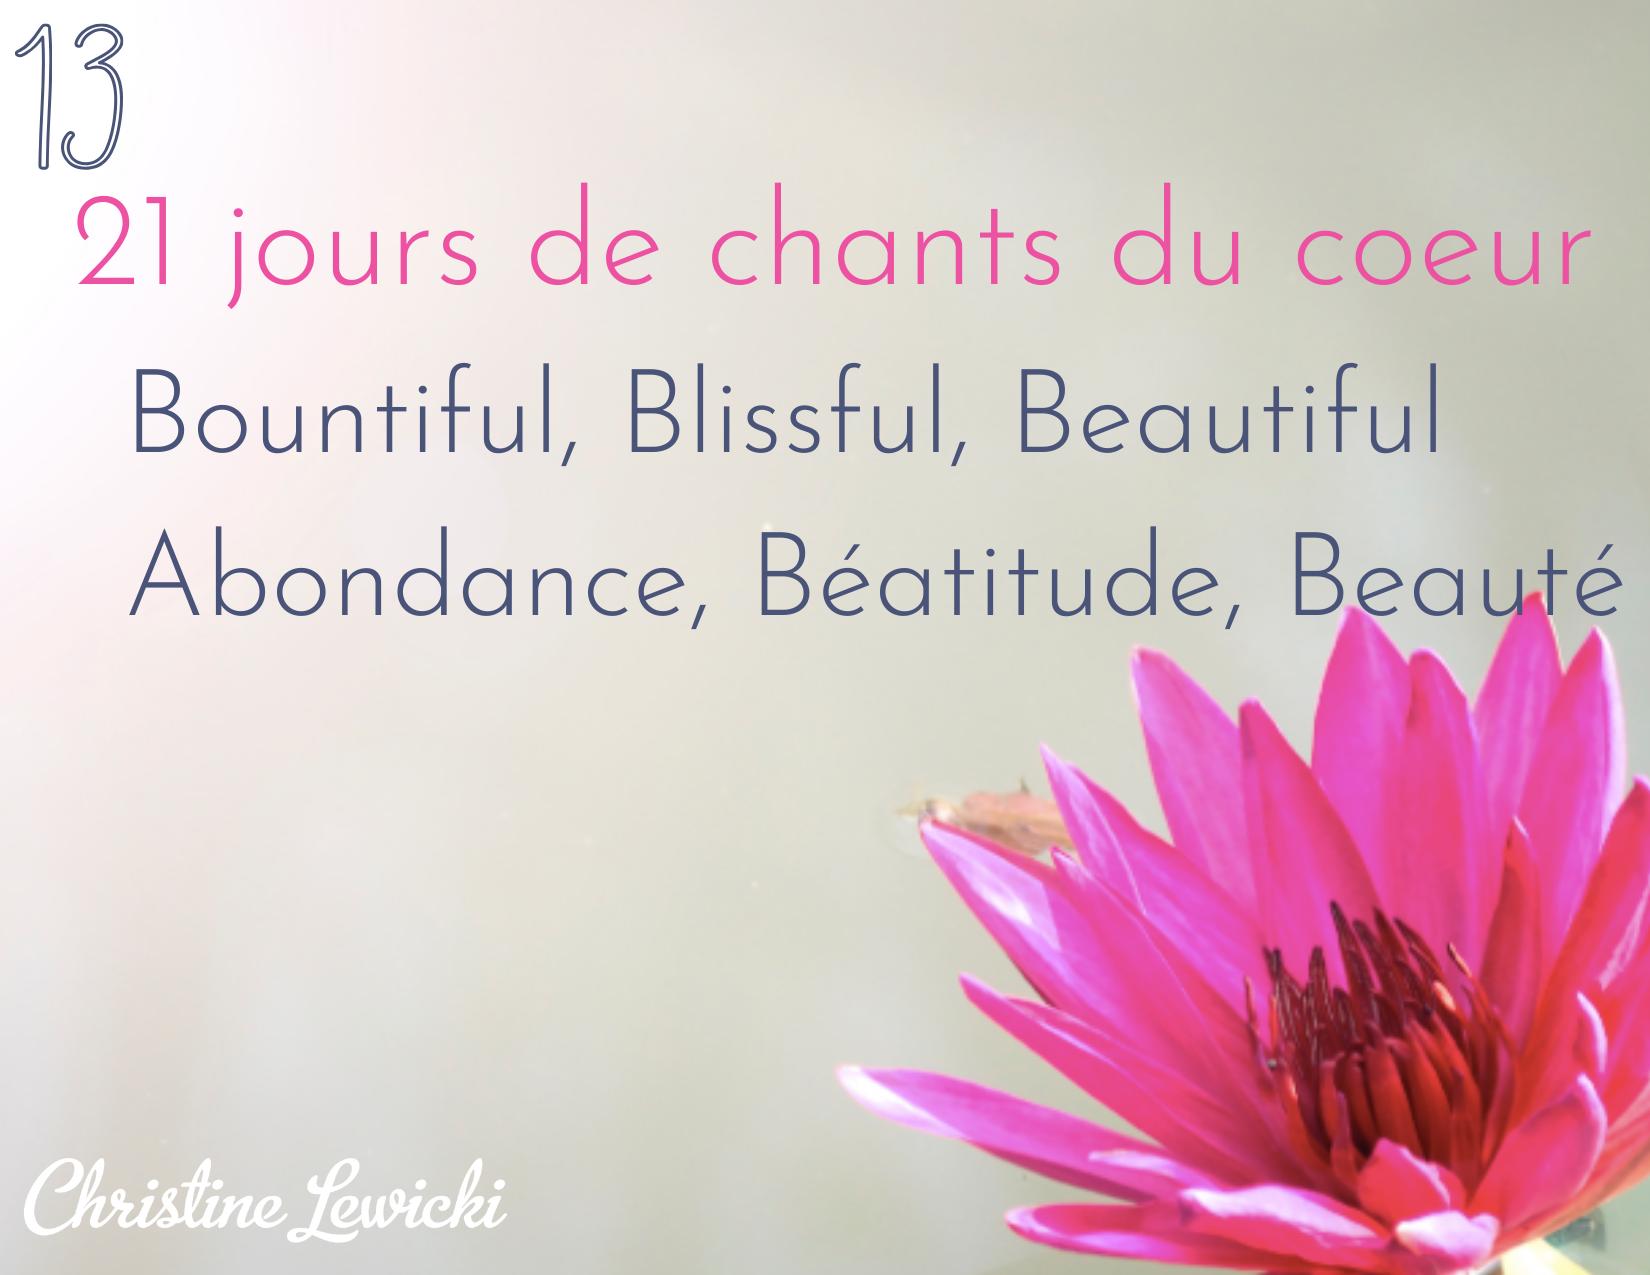 Bountiful, Blissful, Beautiful